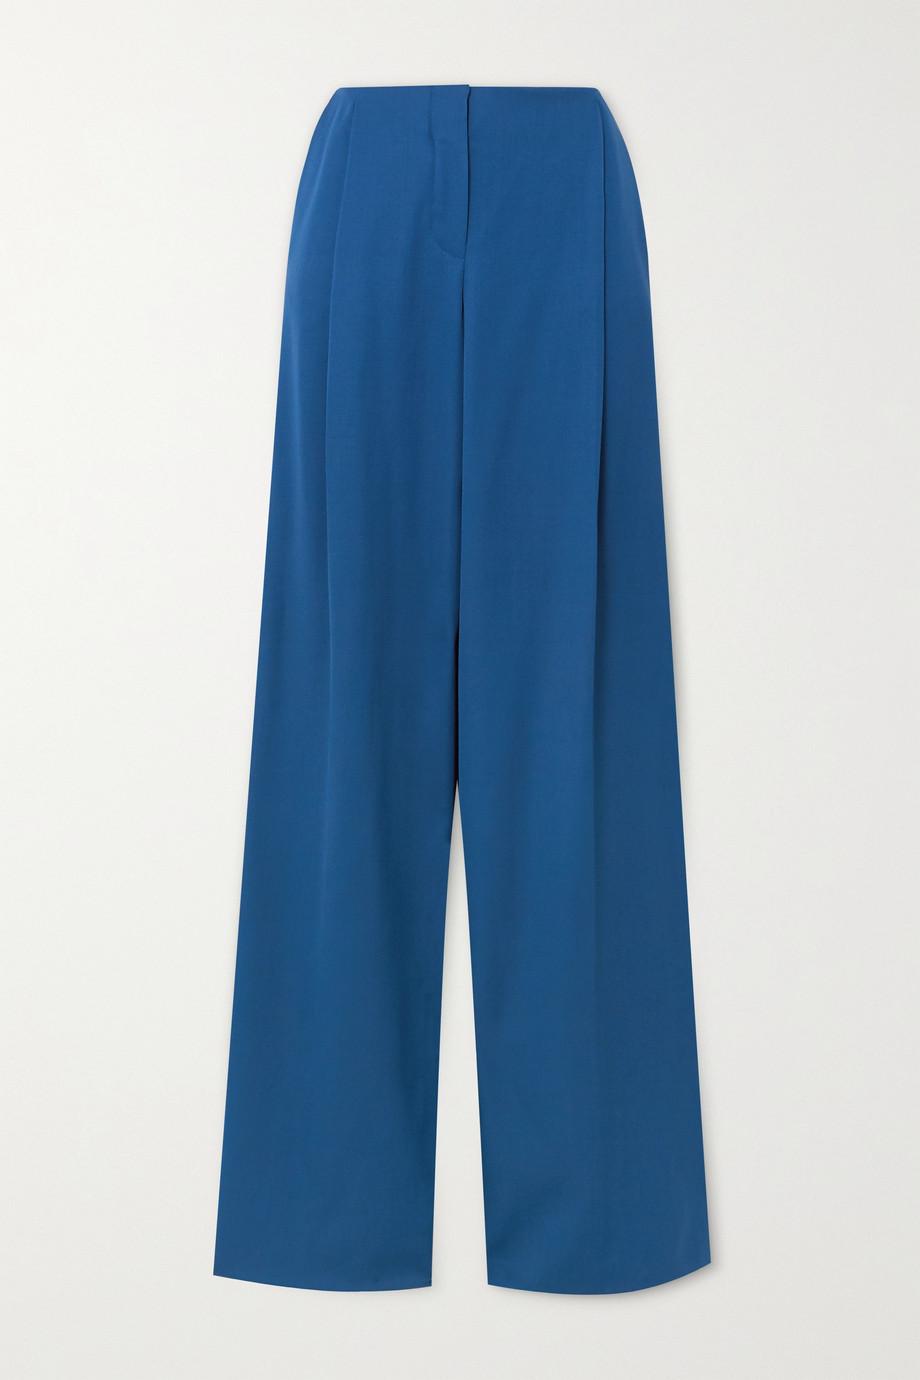 Nina Ricci Wool wide-leg pants